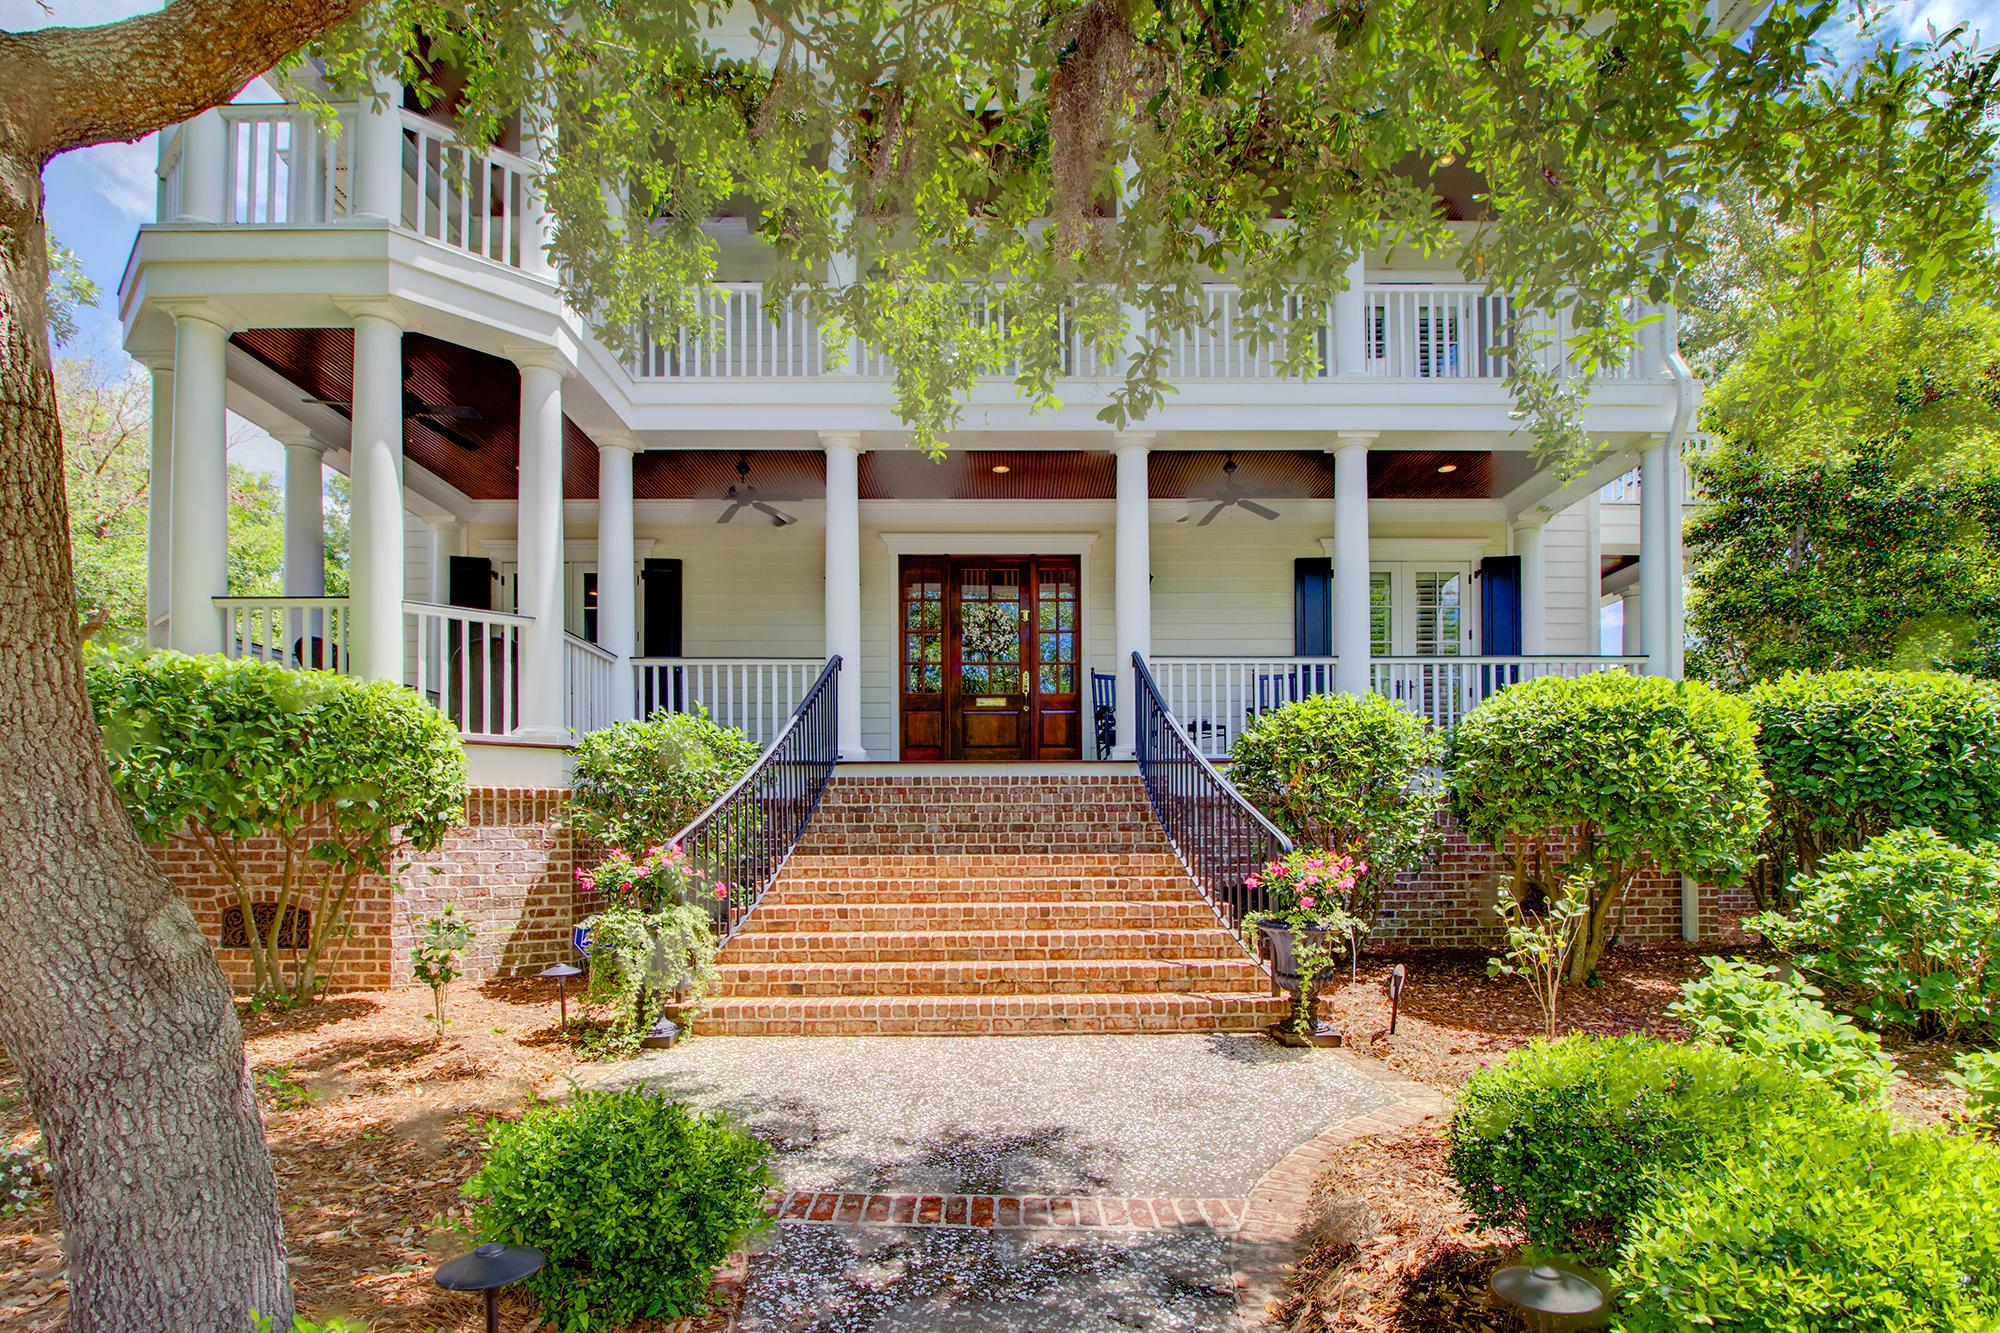 Daniel Island Park Homes For Sale - 1 Lafar, Daniel Island, SC - 44